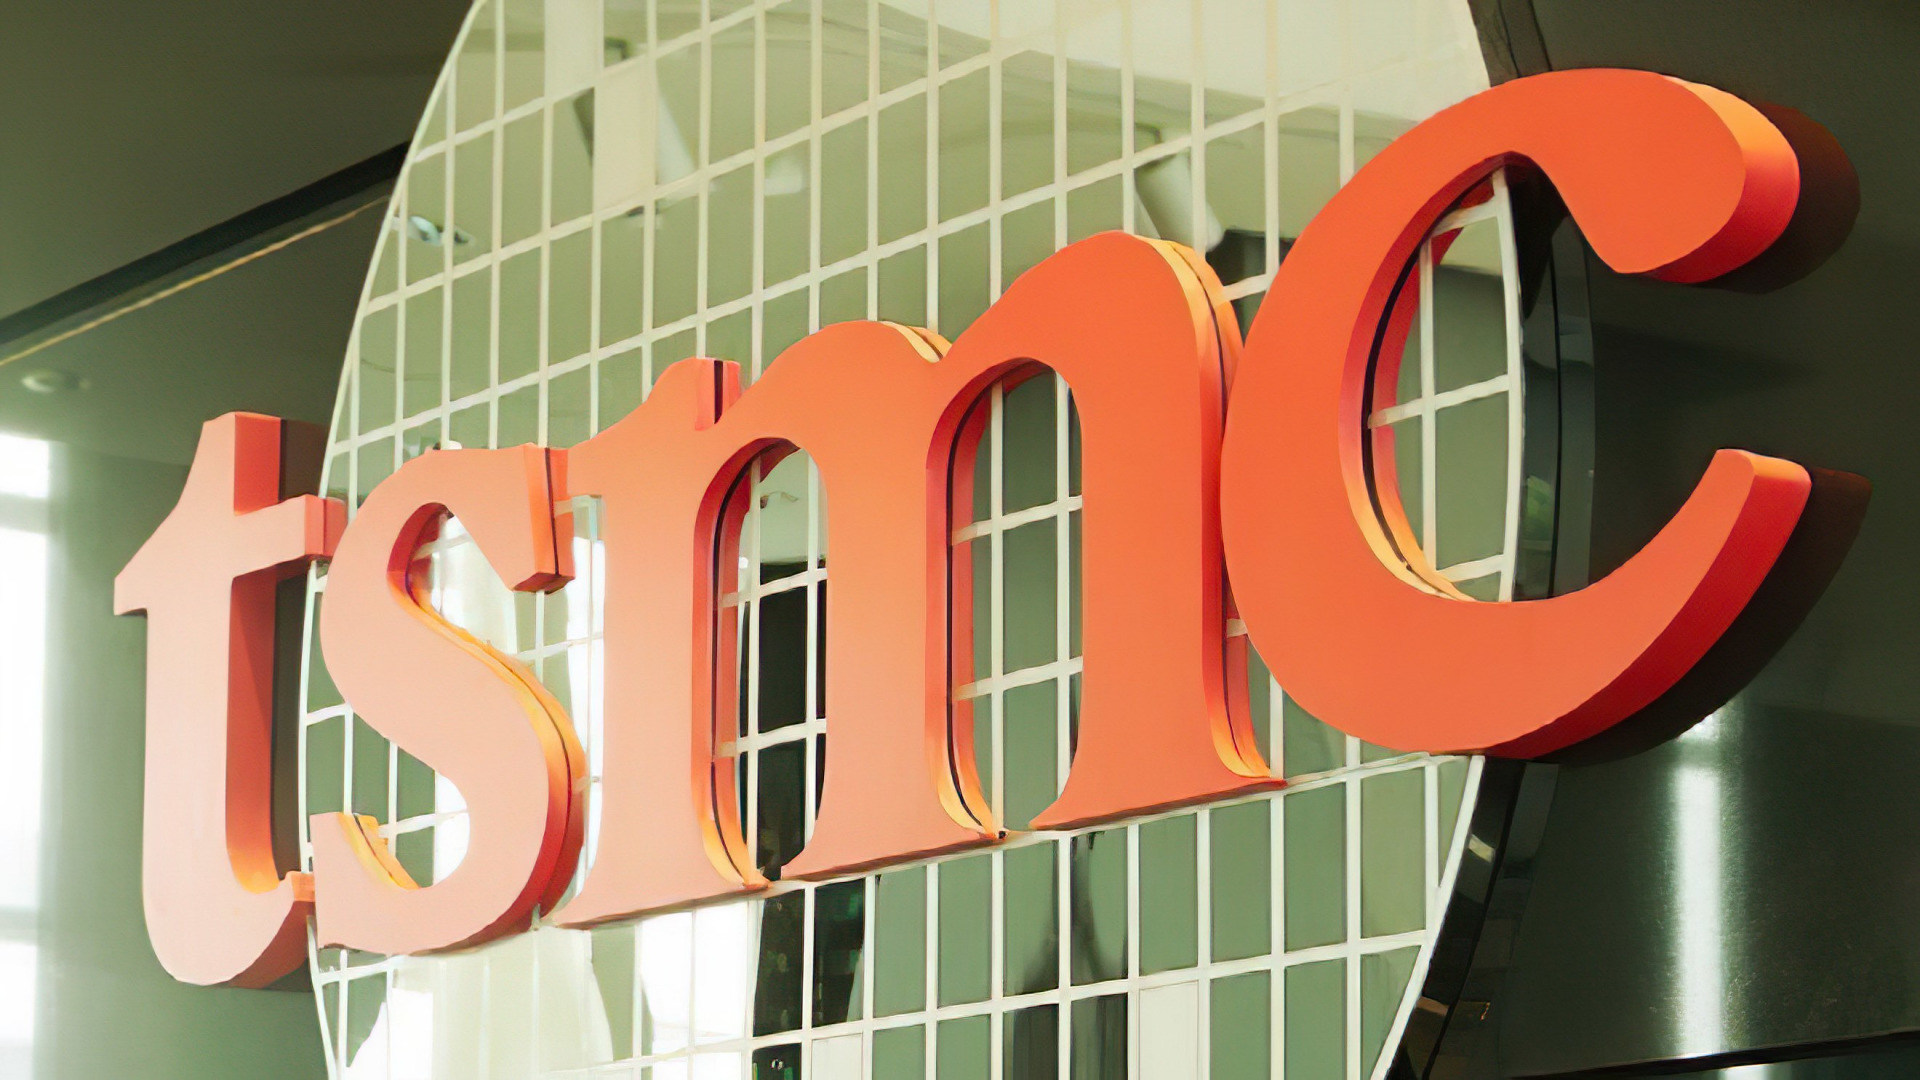 Logo, Tsmc, Taiwan Semiconductor Manufacturing Company